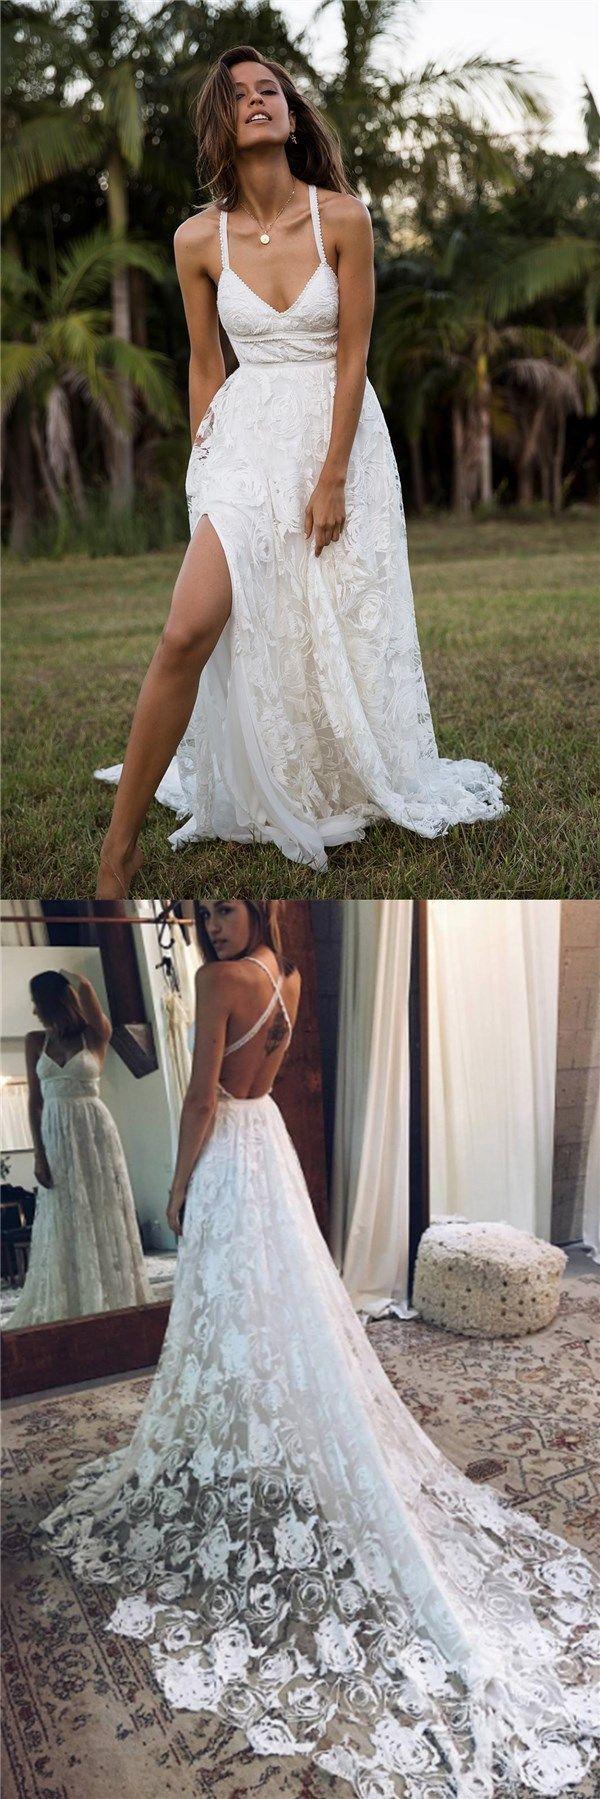 Lace strap wedding dress   Charming Lace Long Aline Fashion Spaghetti Straps Wedding